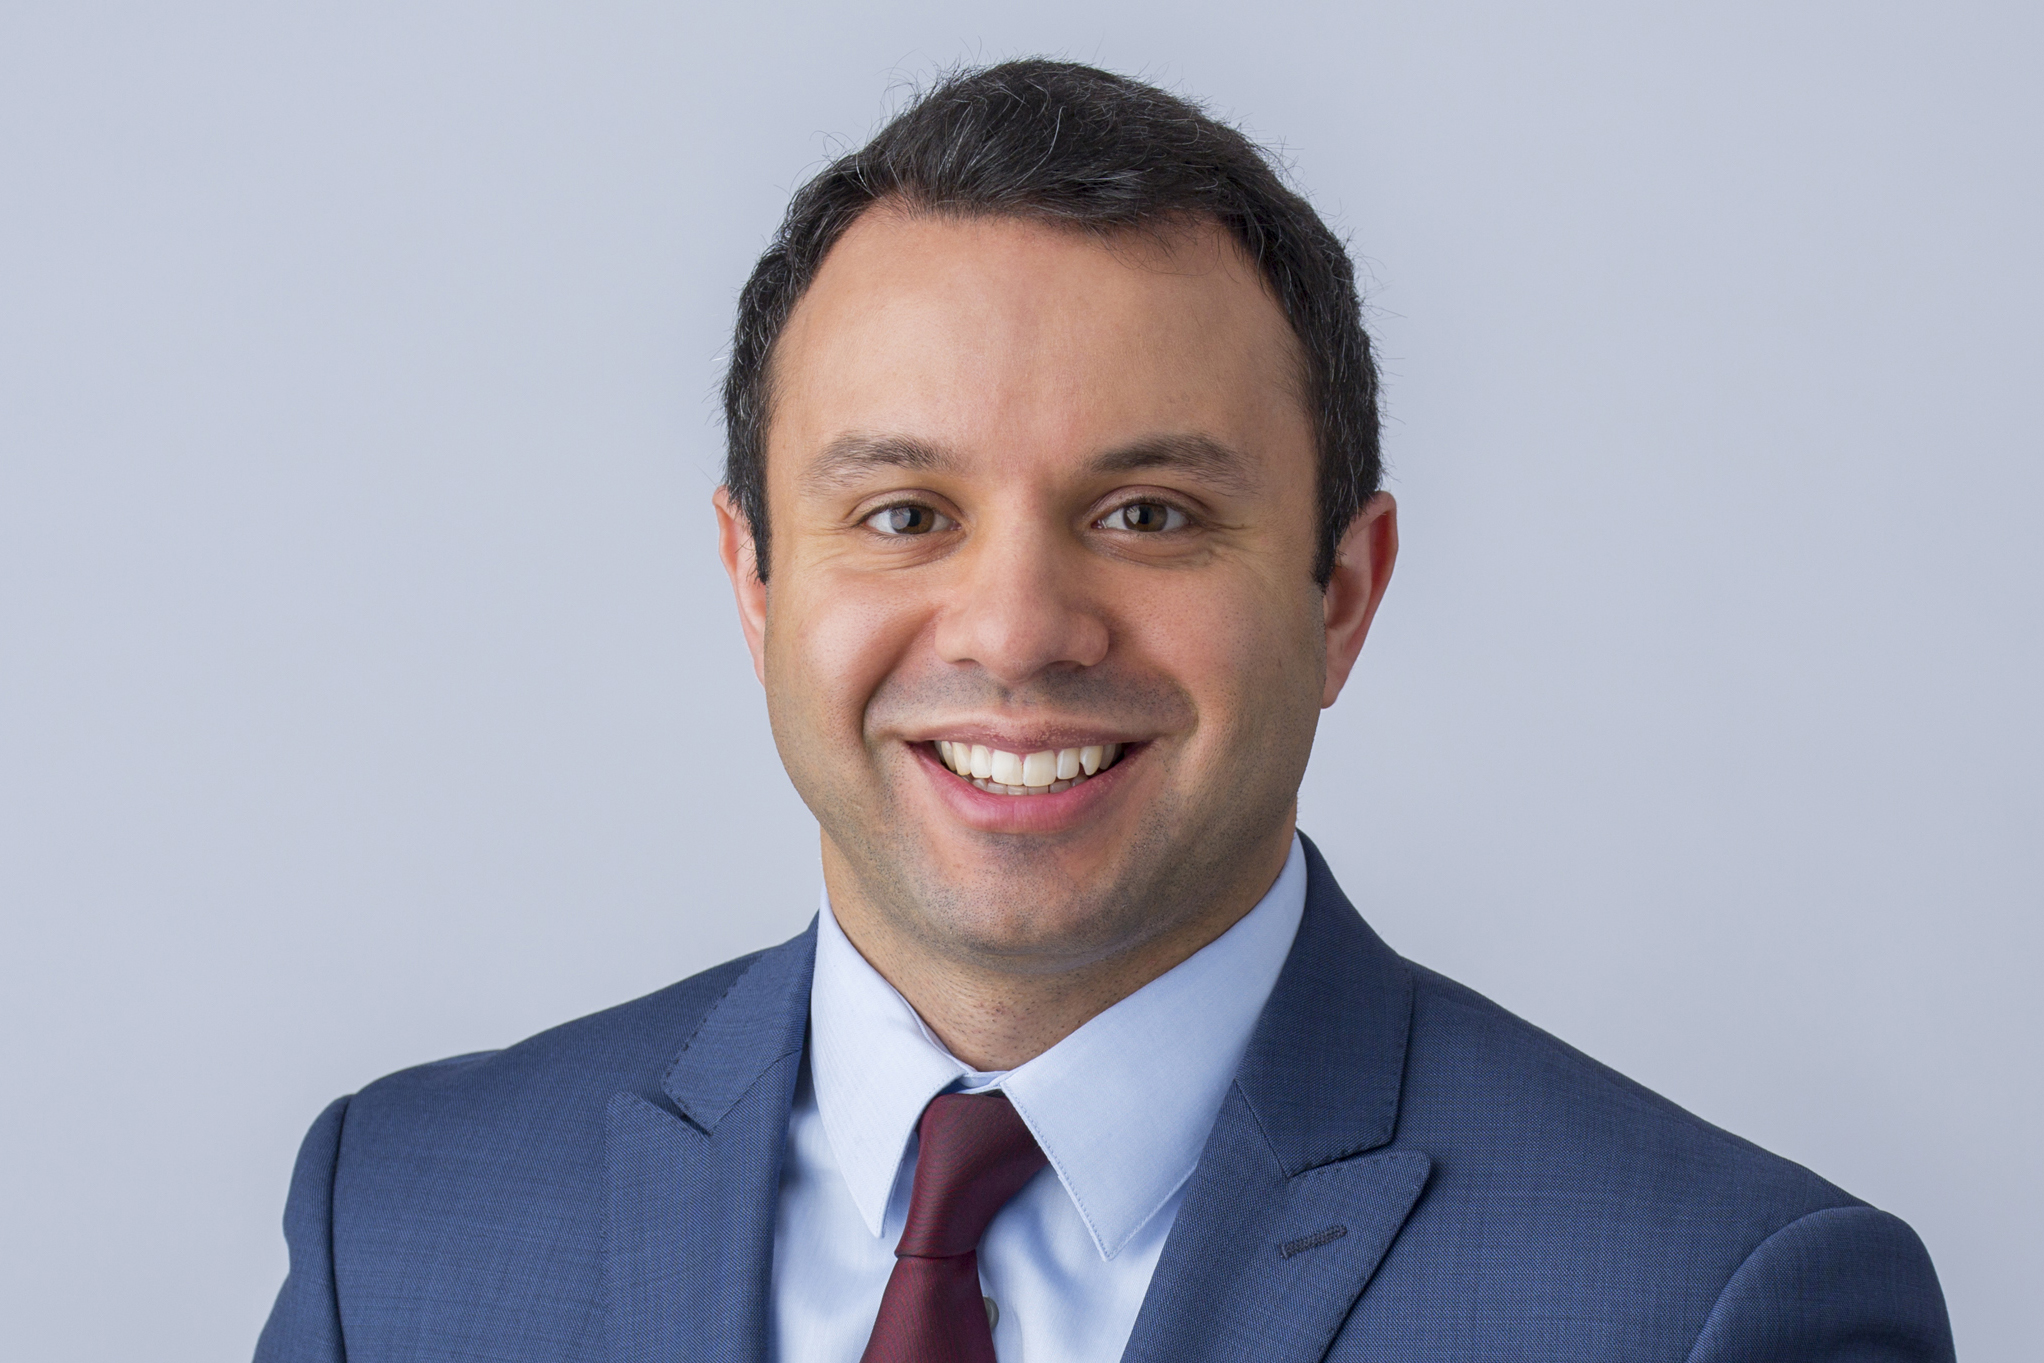 Philip Lombino